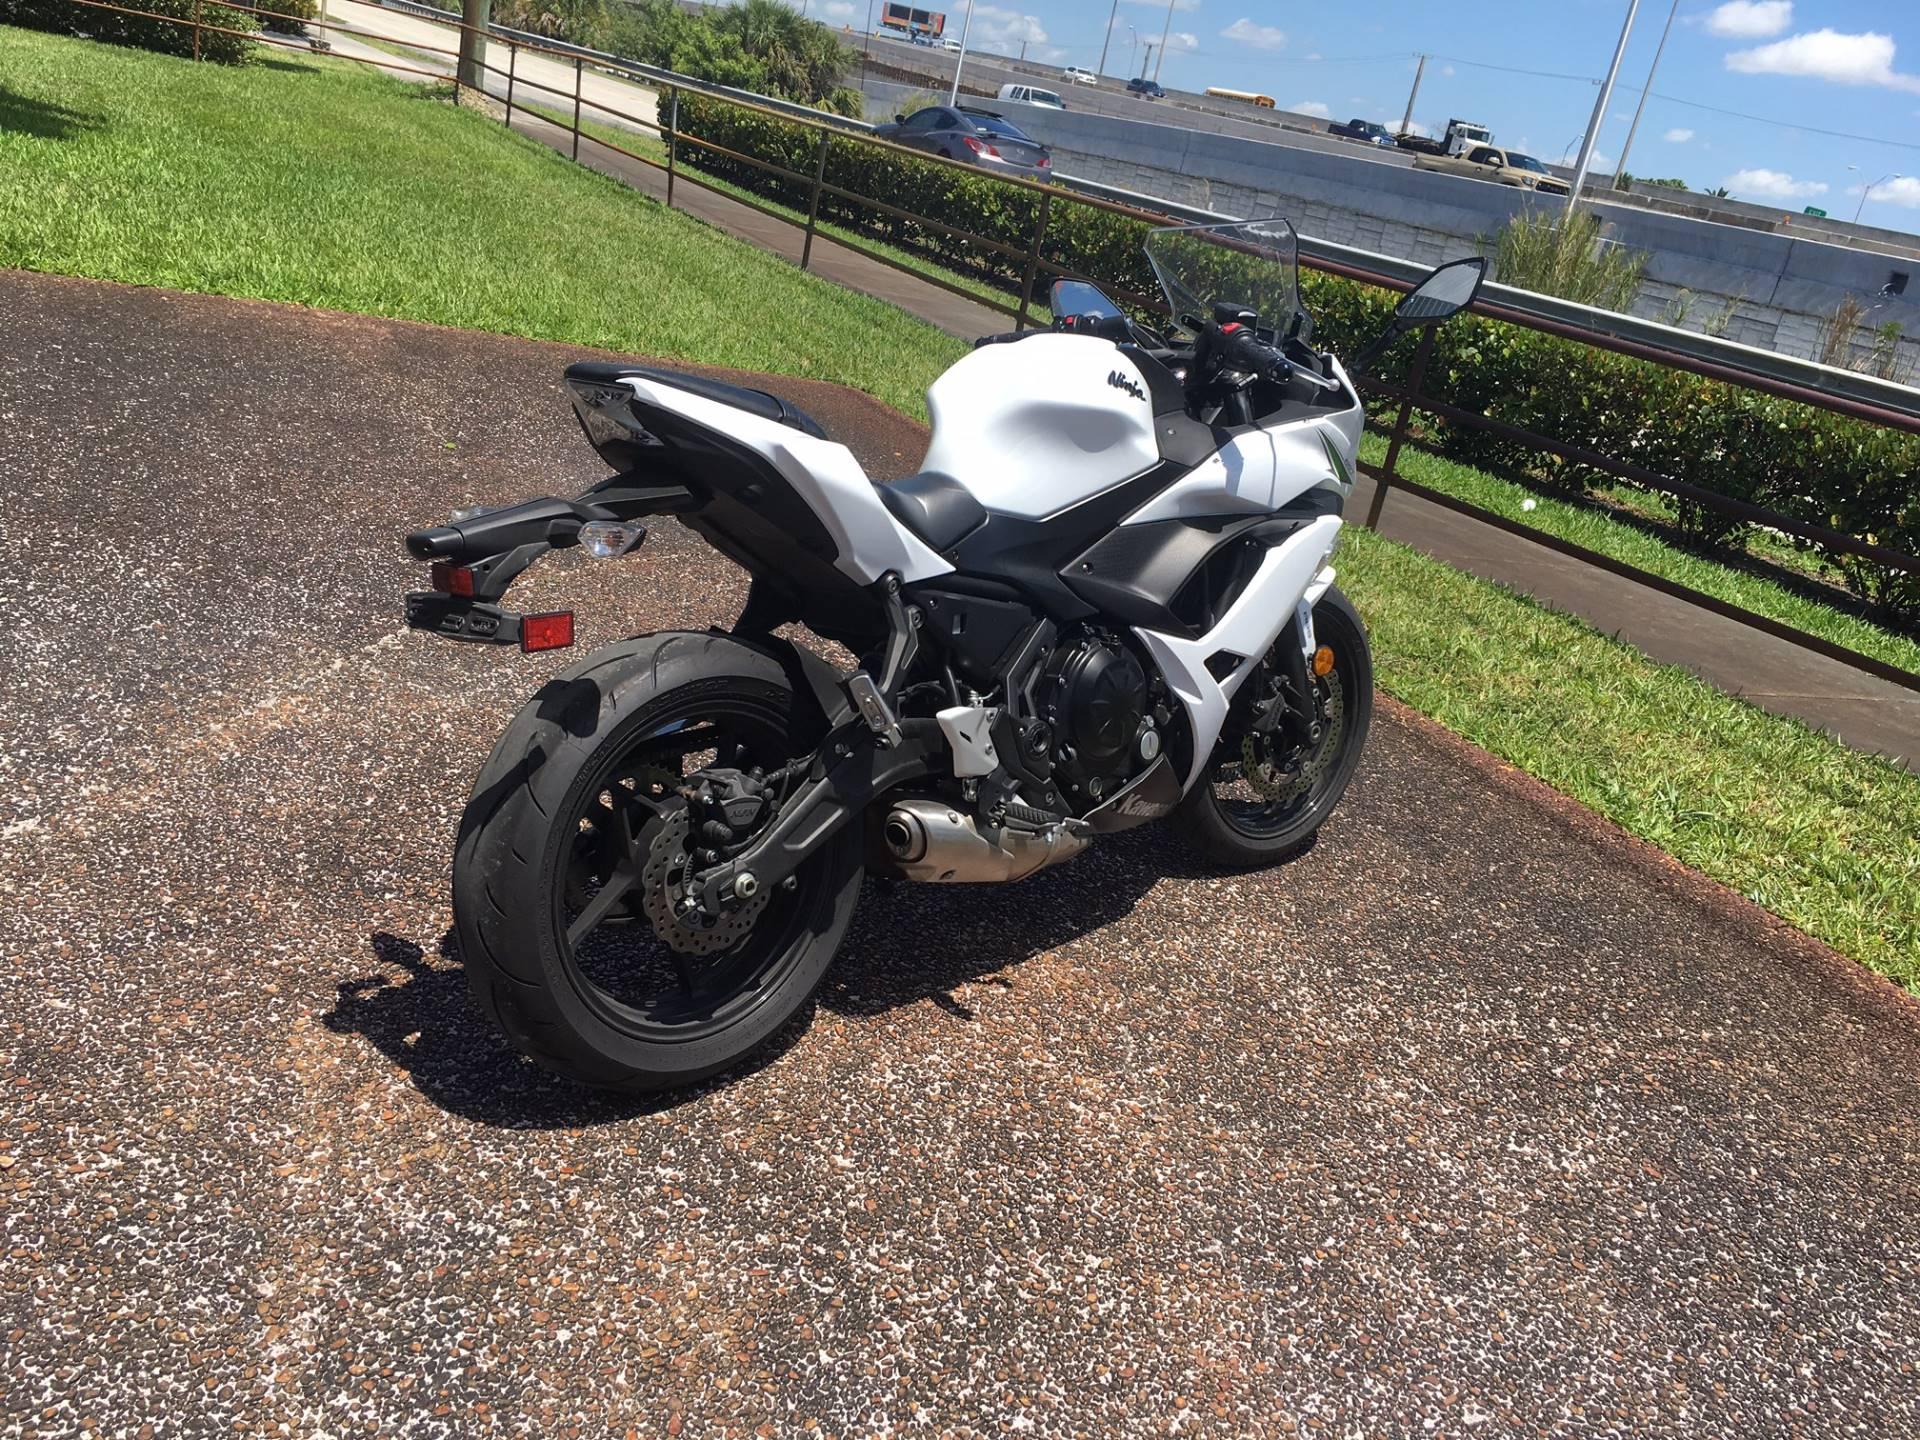 Used 2017 Kawasaki Ninja 650 Abs Motorcycles In Hialeah Fl